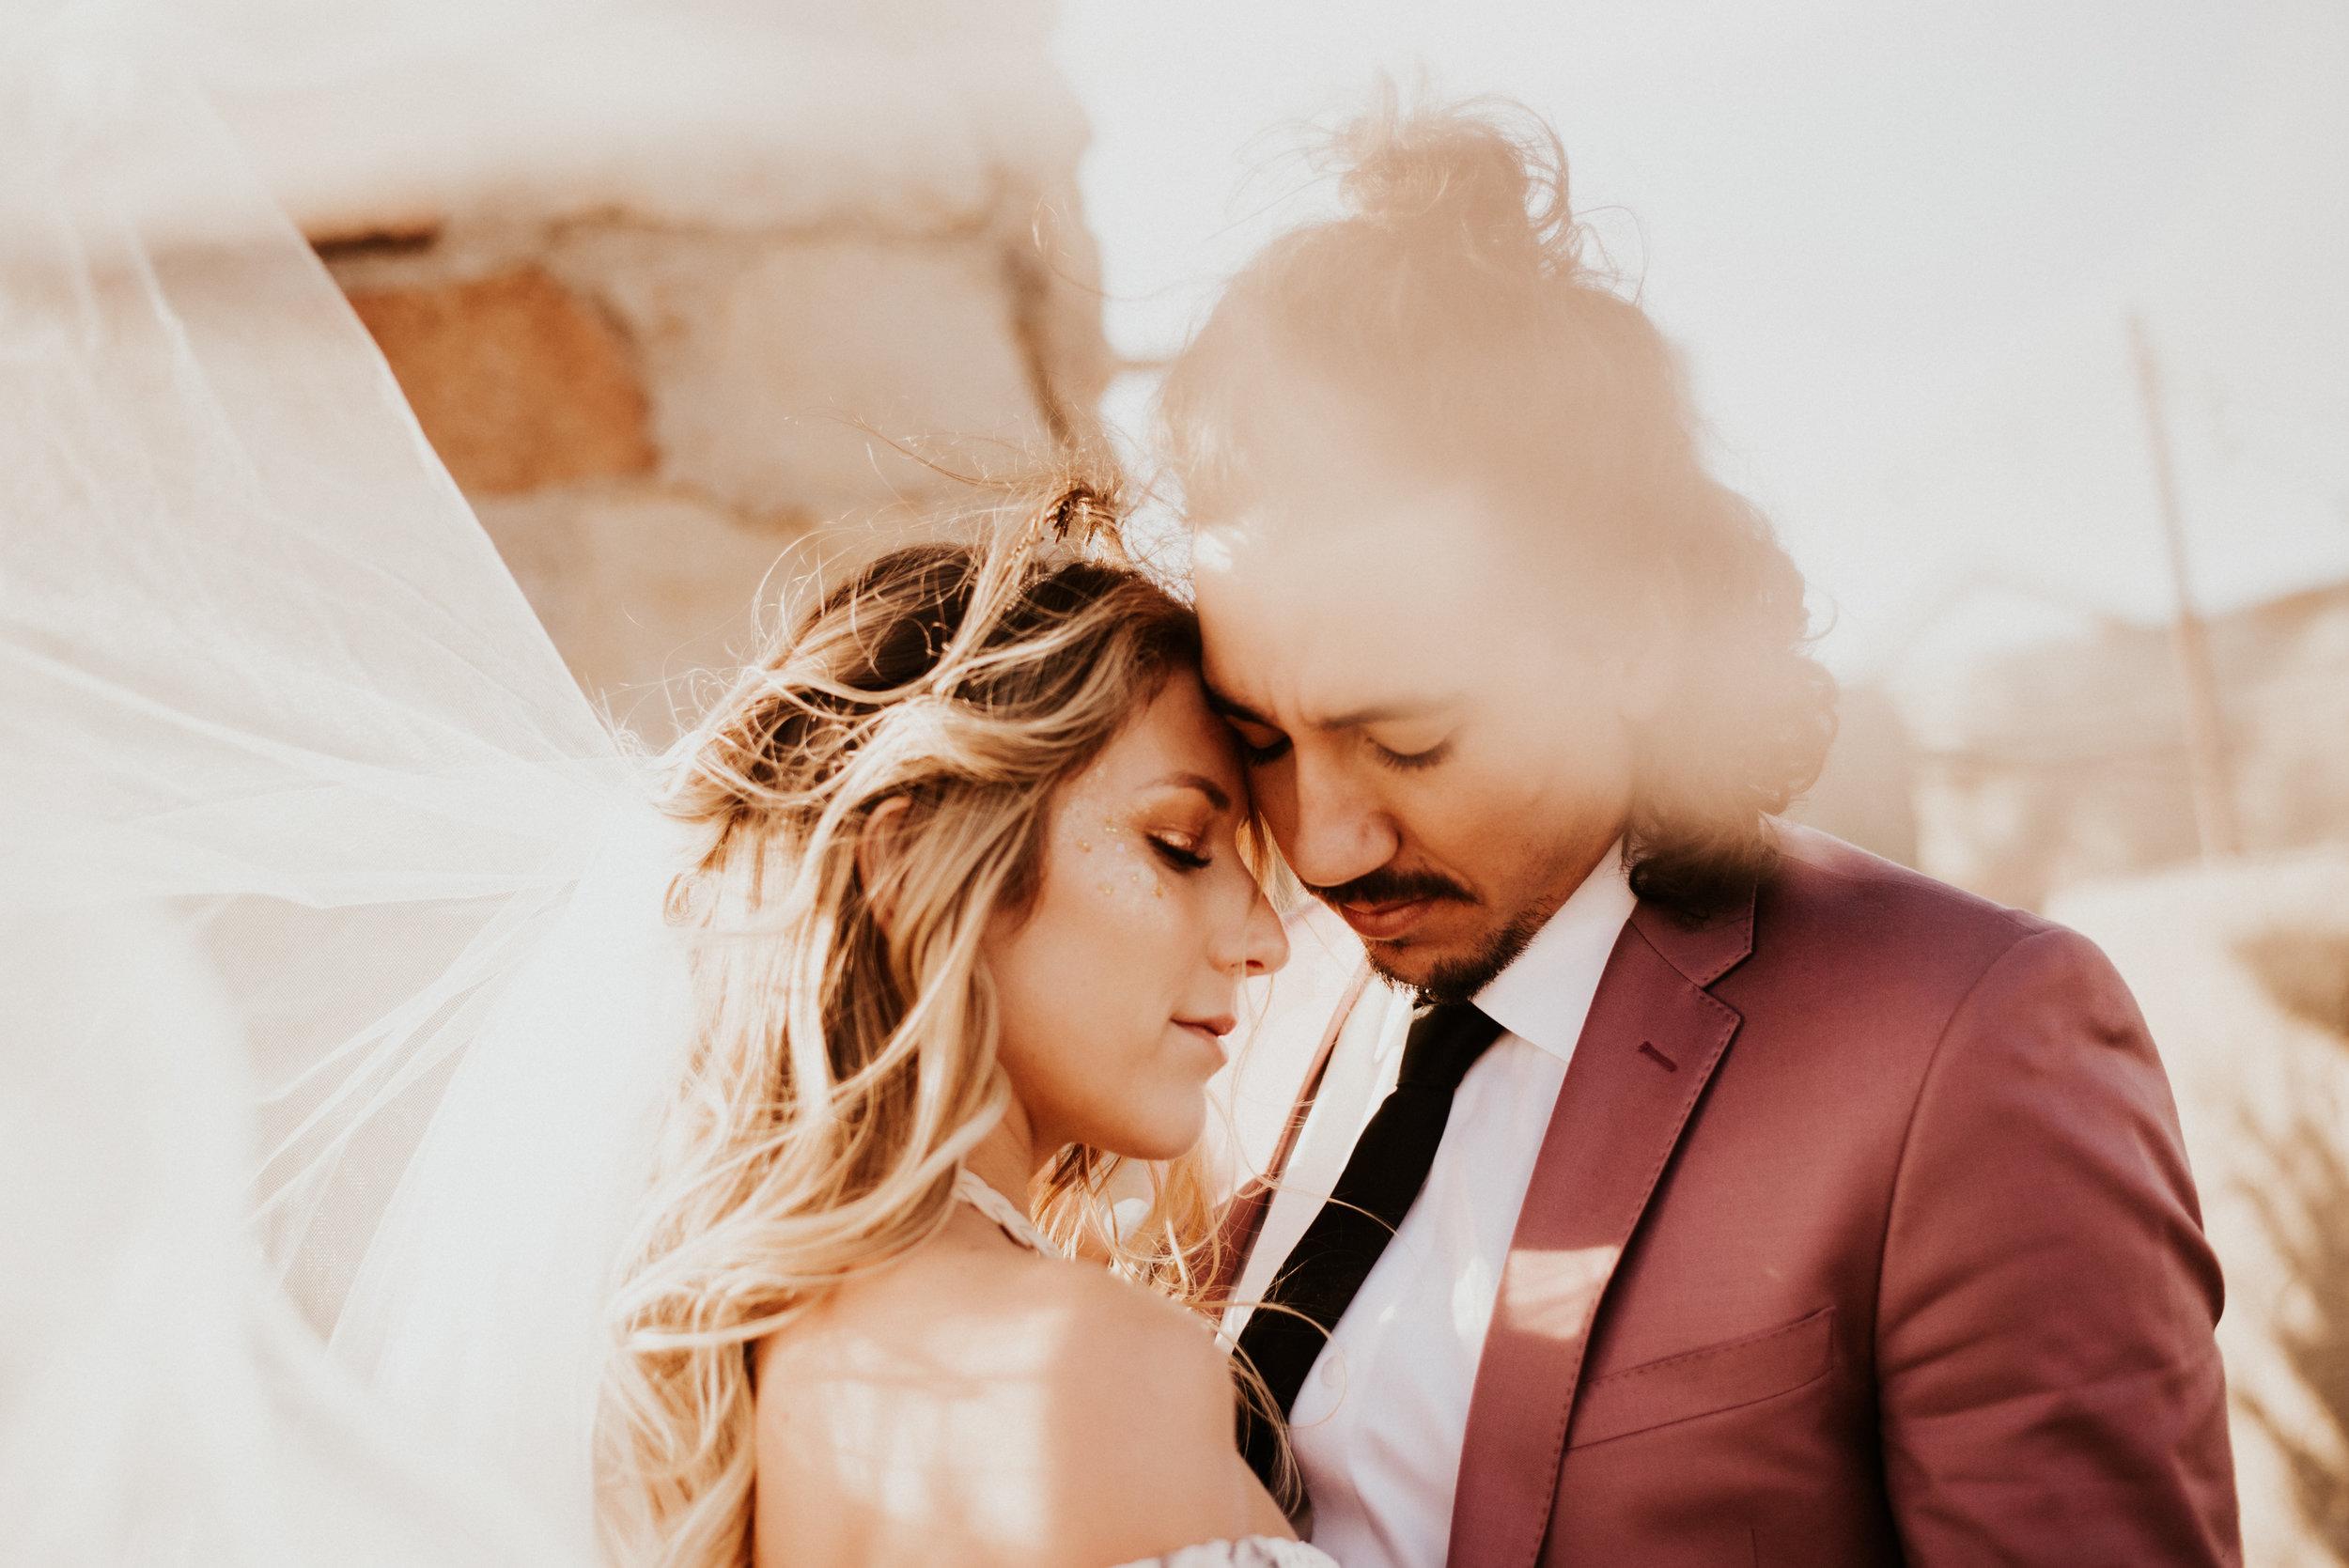 FortSt.John_photographer_TyraEPhotography_Wedding_Couple_Family_Photograhy_DawsonCreek_Elopement_Bride_Boduoir_Portraits-7888.jpg